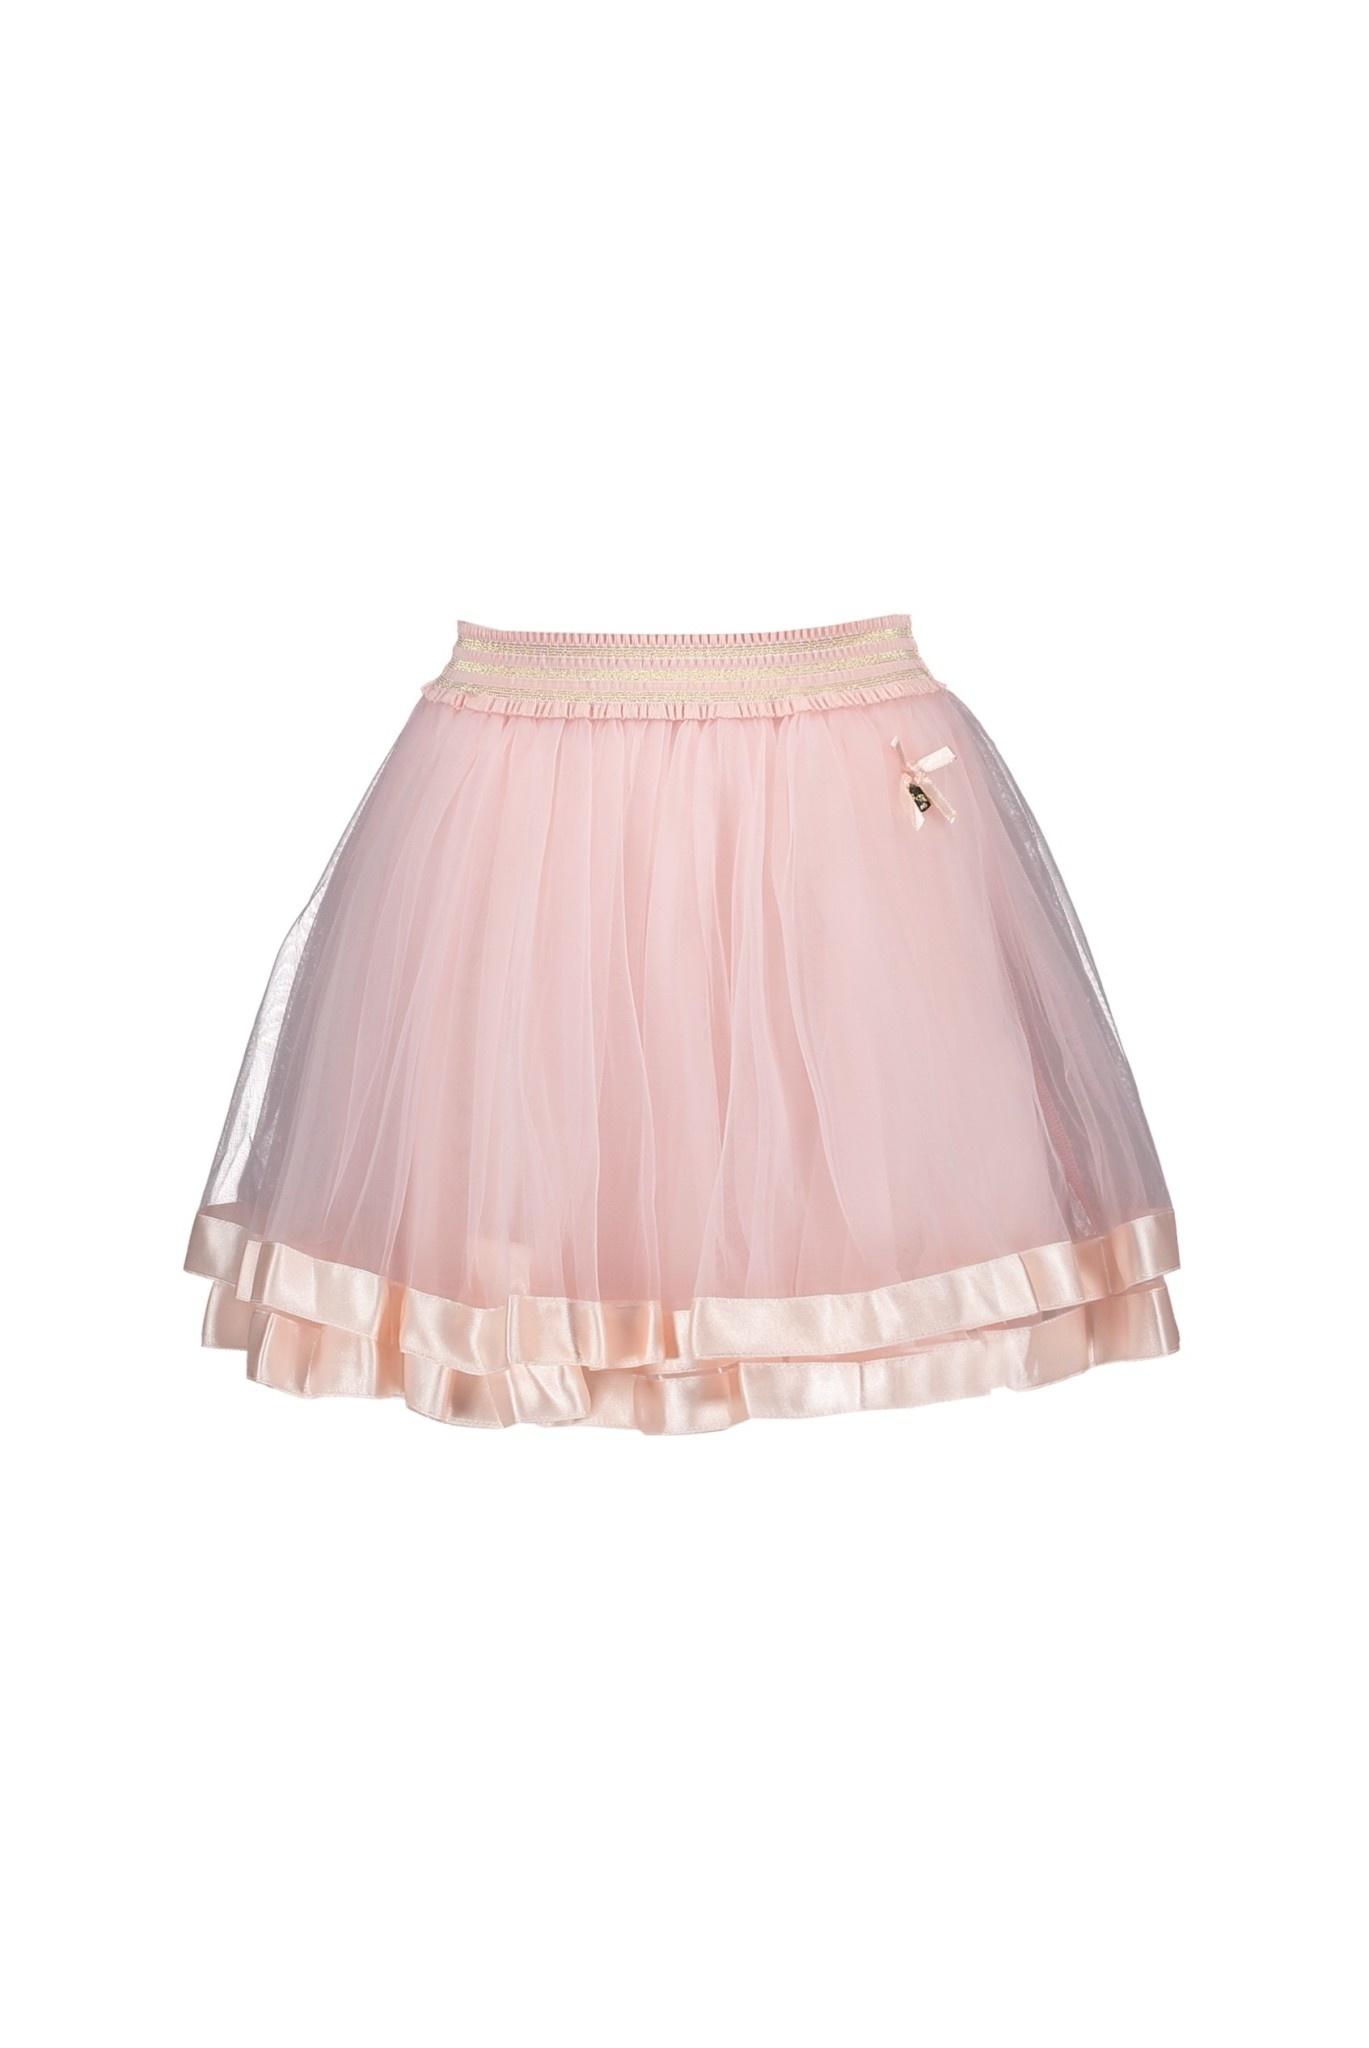 Lechic Lechic petticoat double satin hem